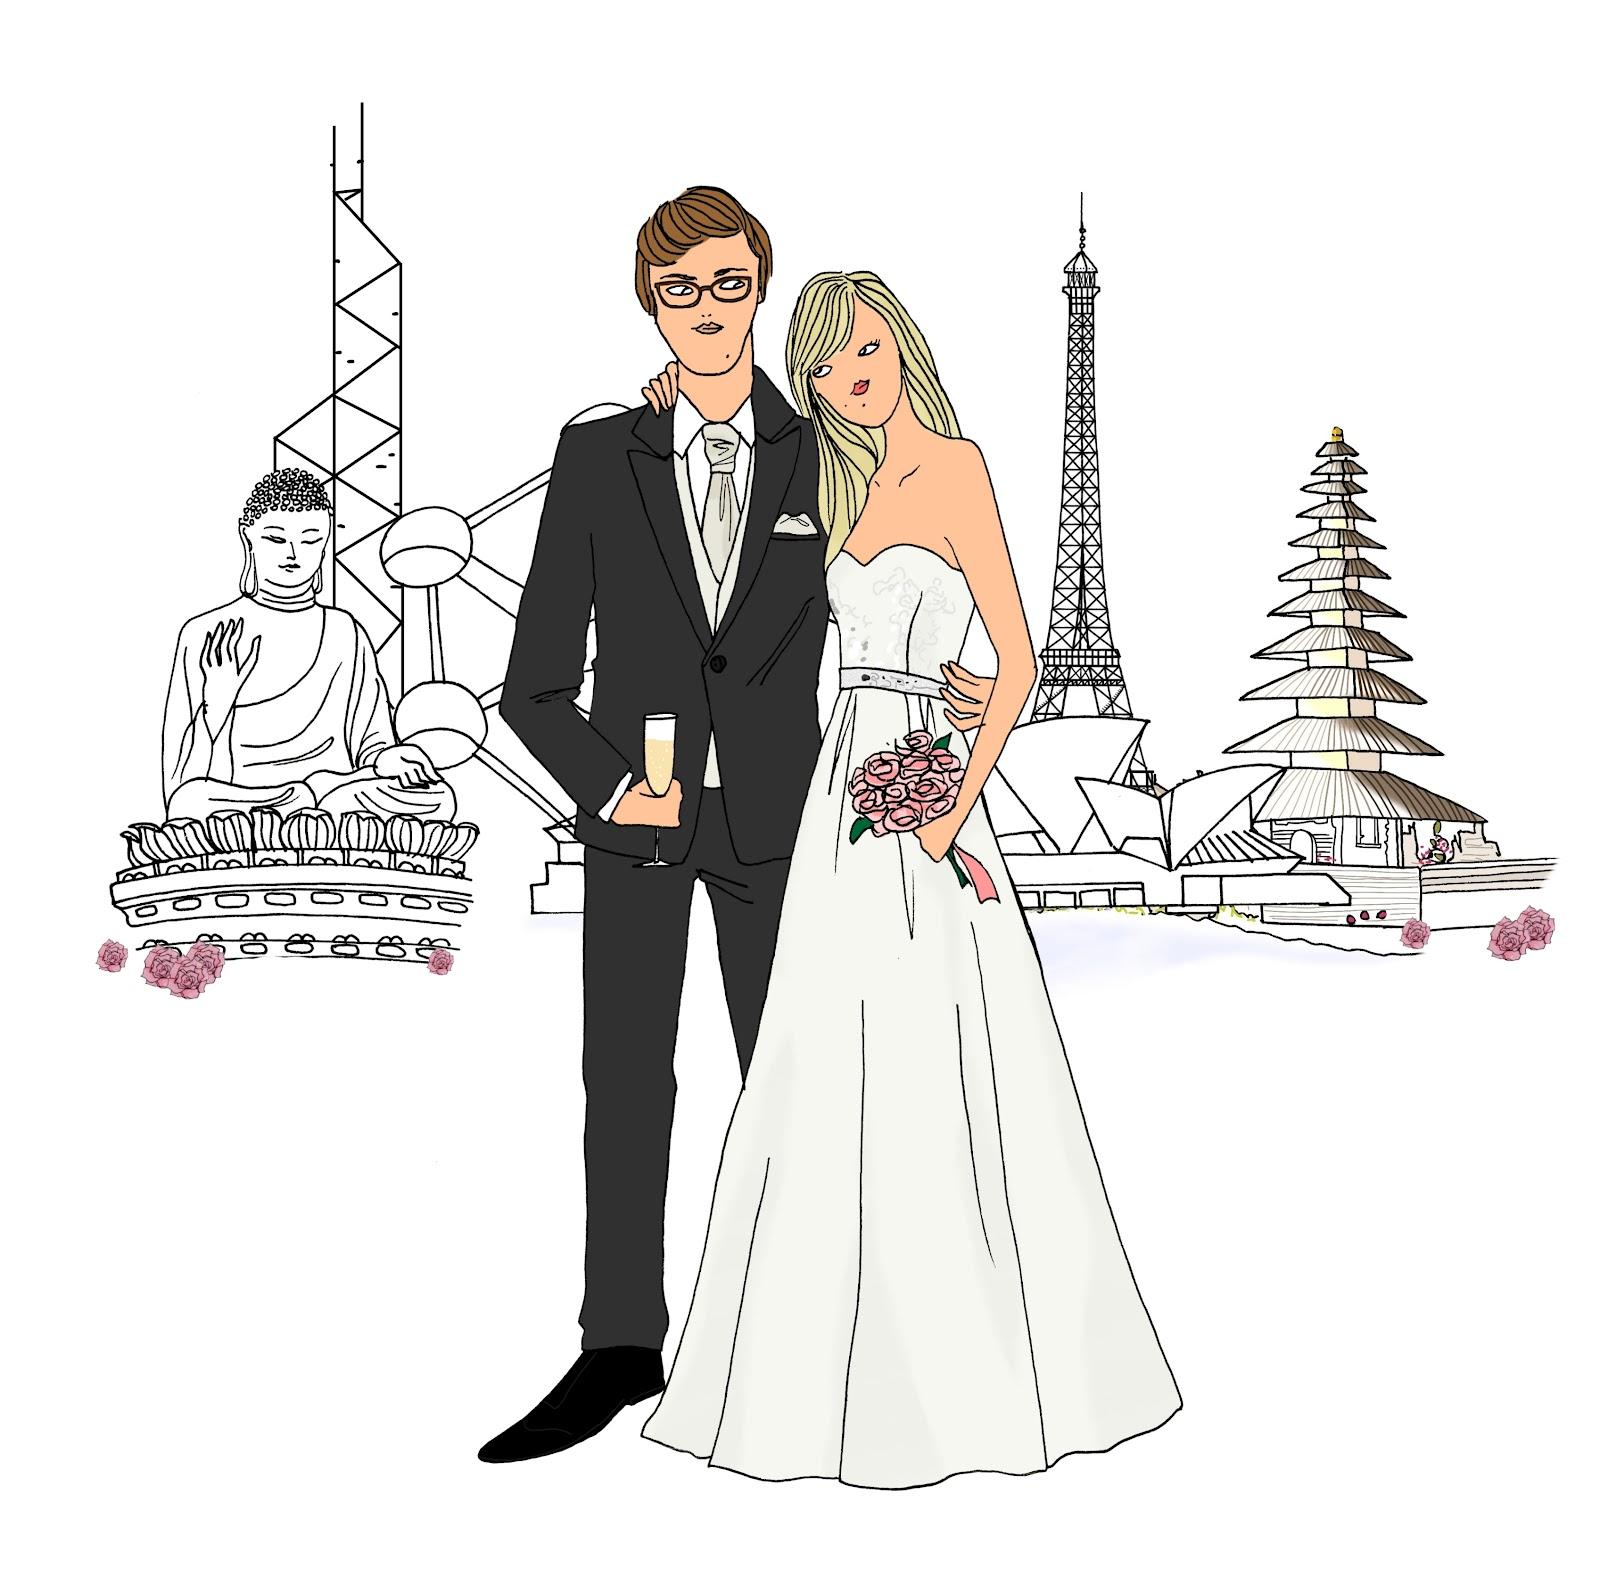 Fabuleux Angeline melin mariage - création faire-part mariage JF45